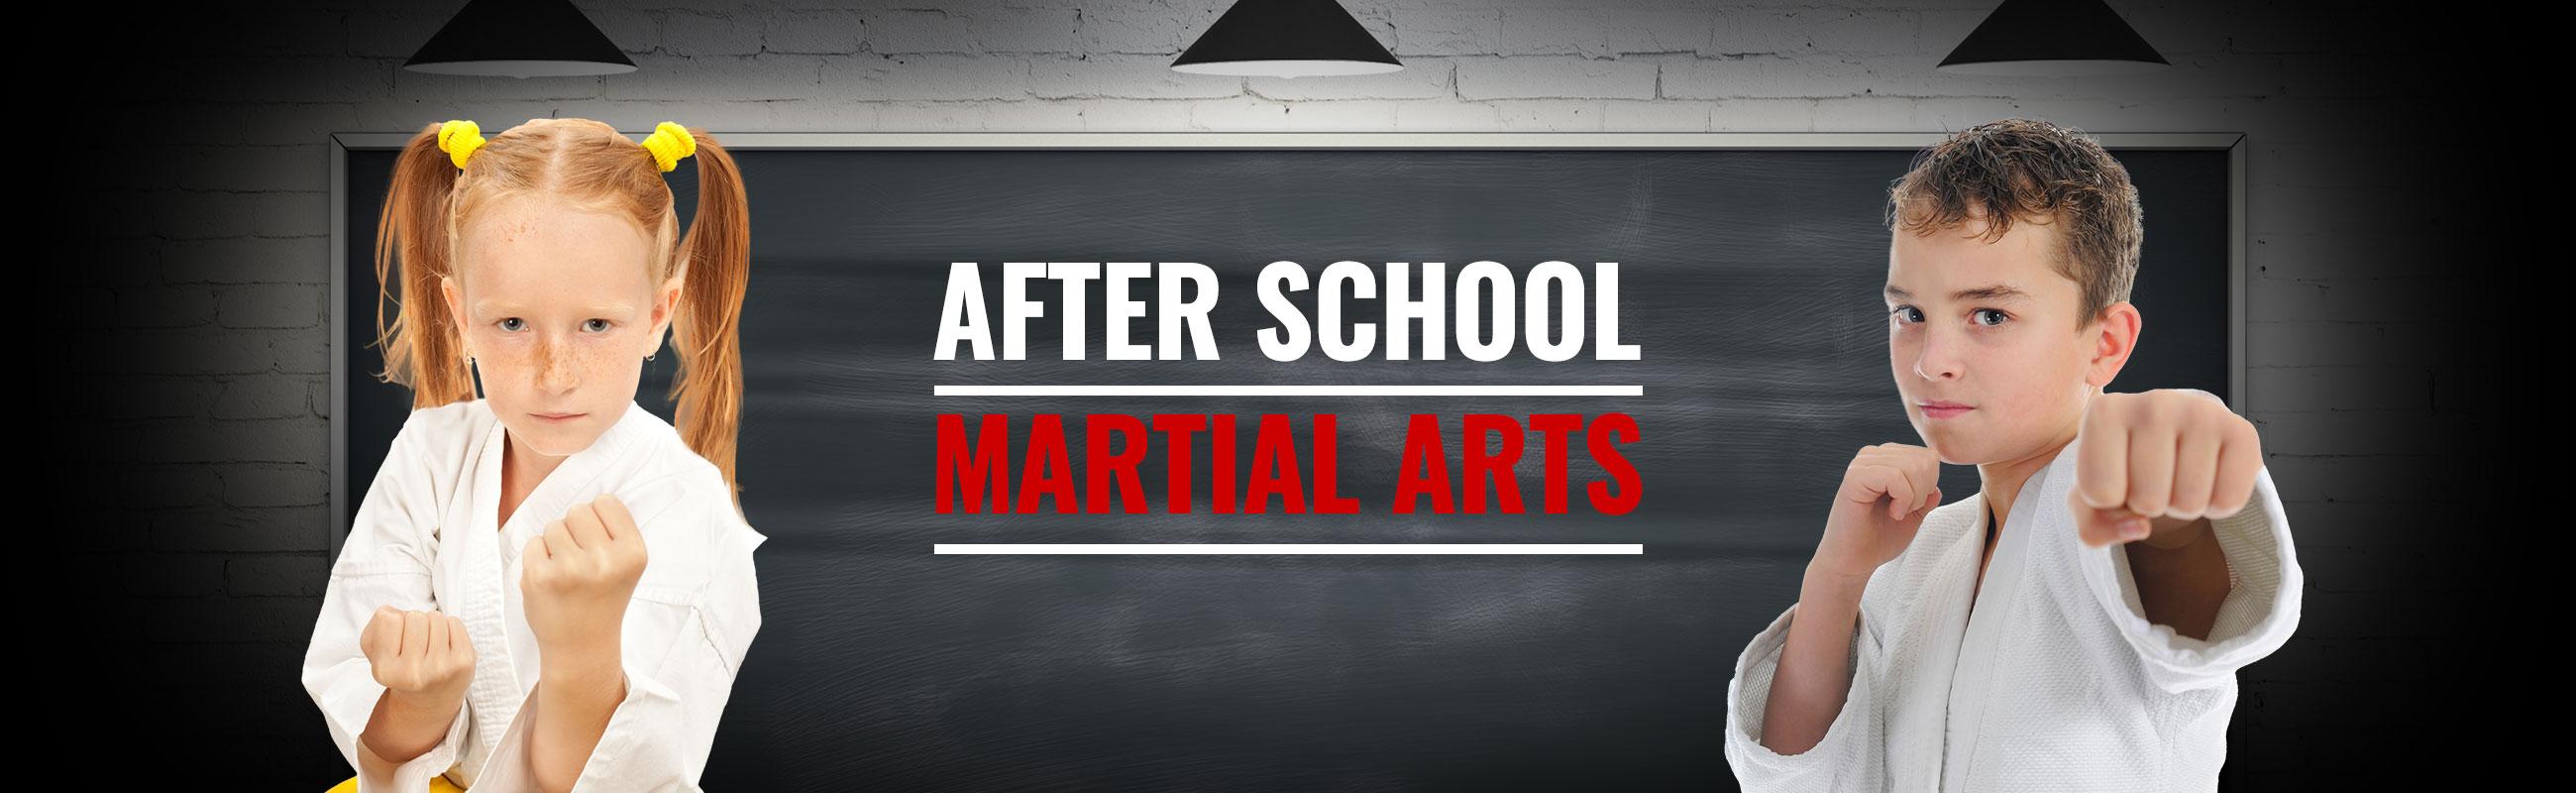 after school martial arts